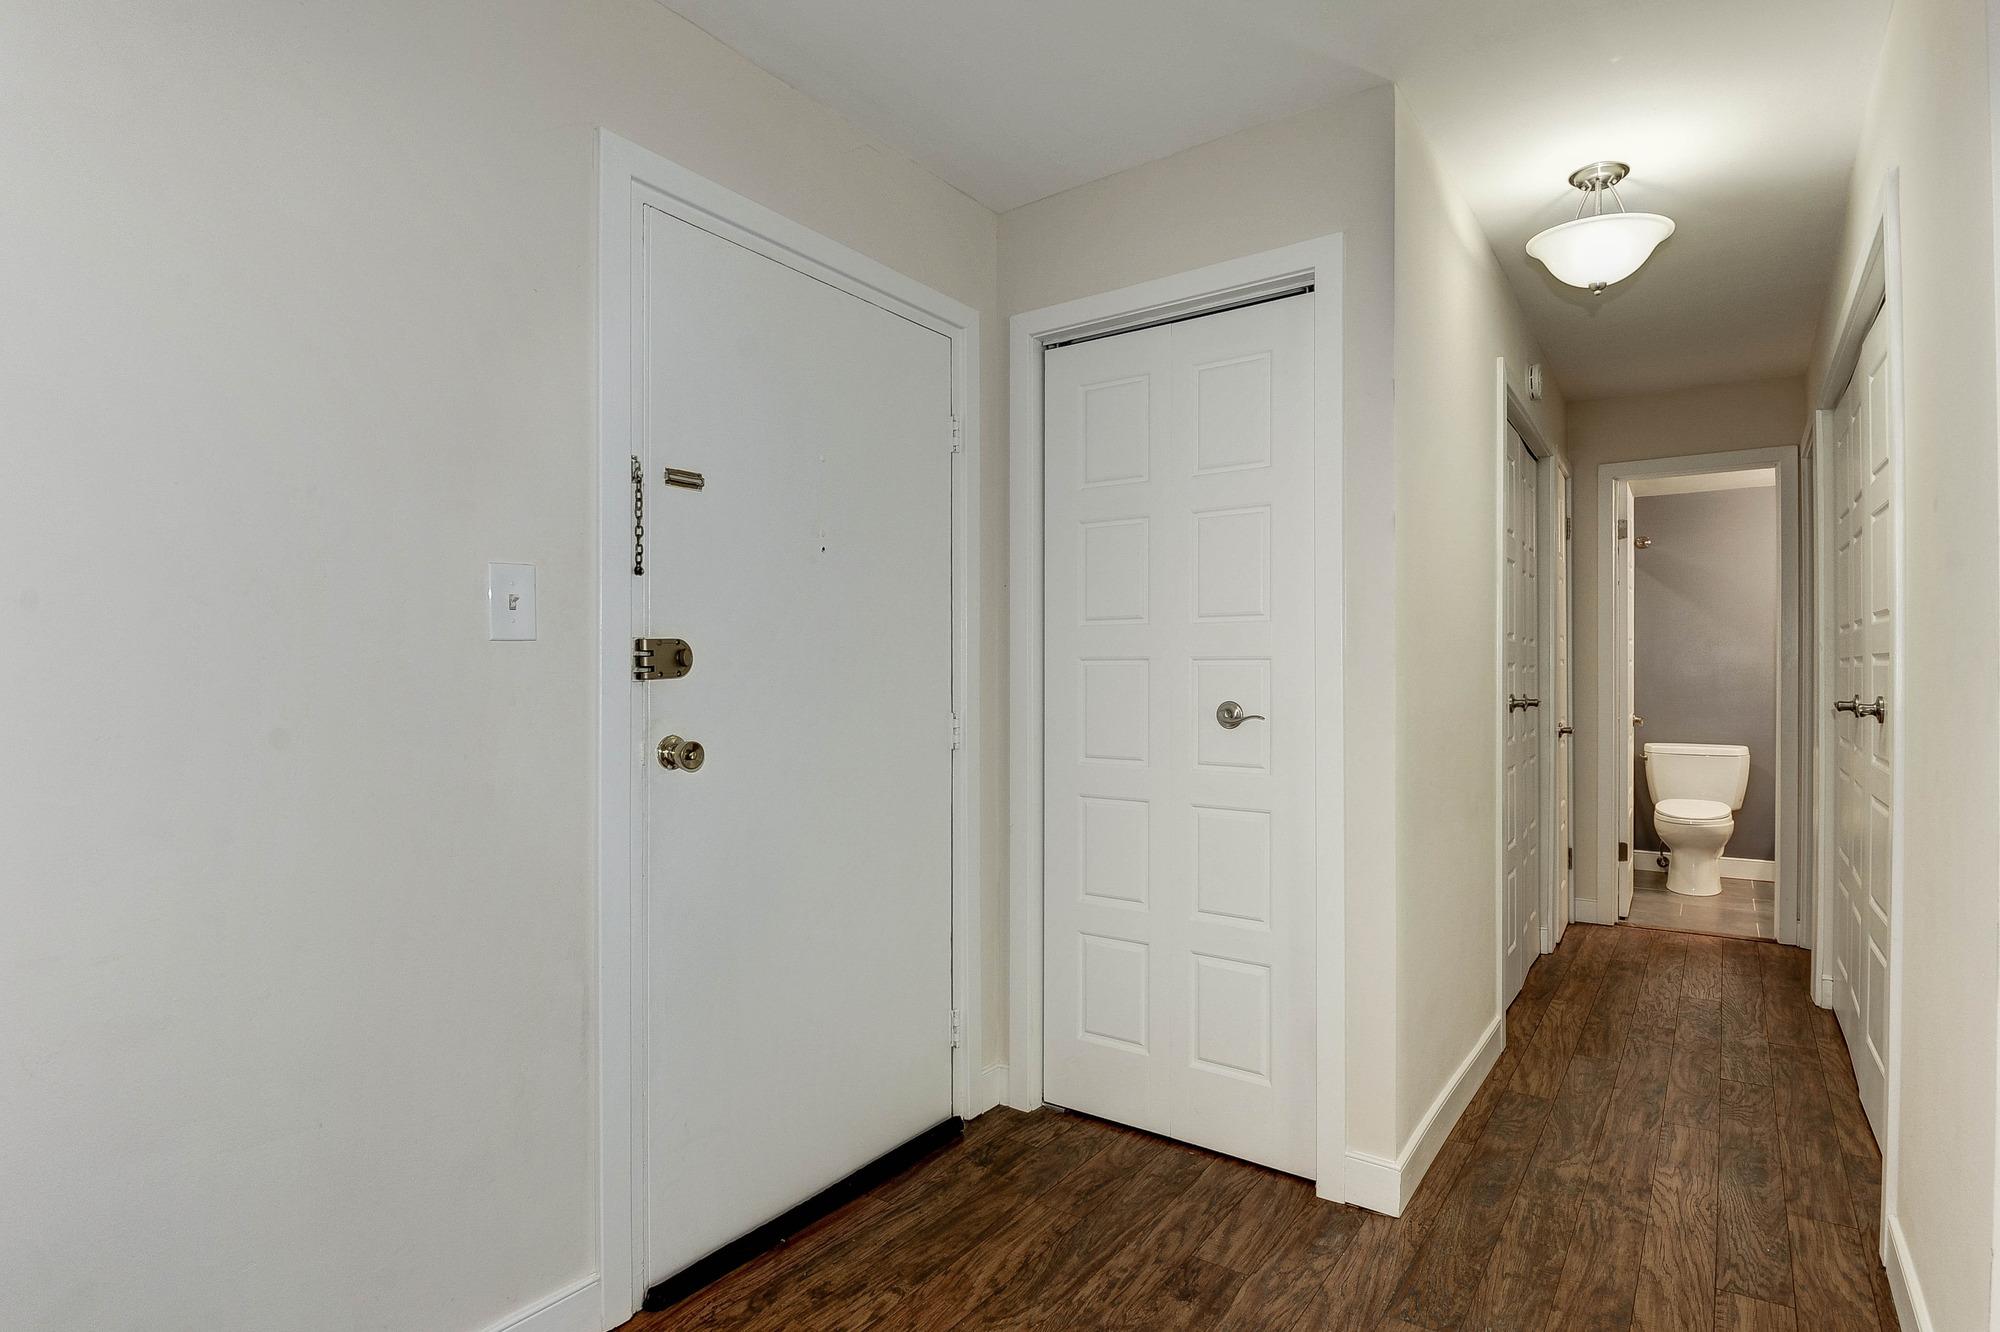 Entryway with WoodFloors